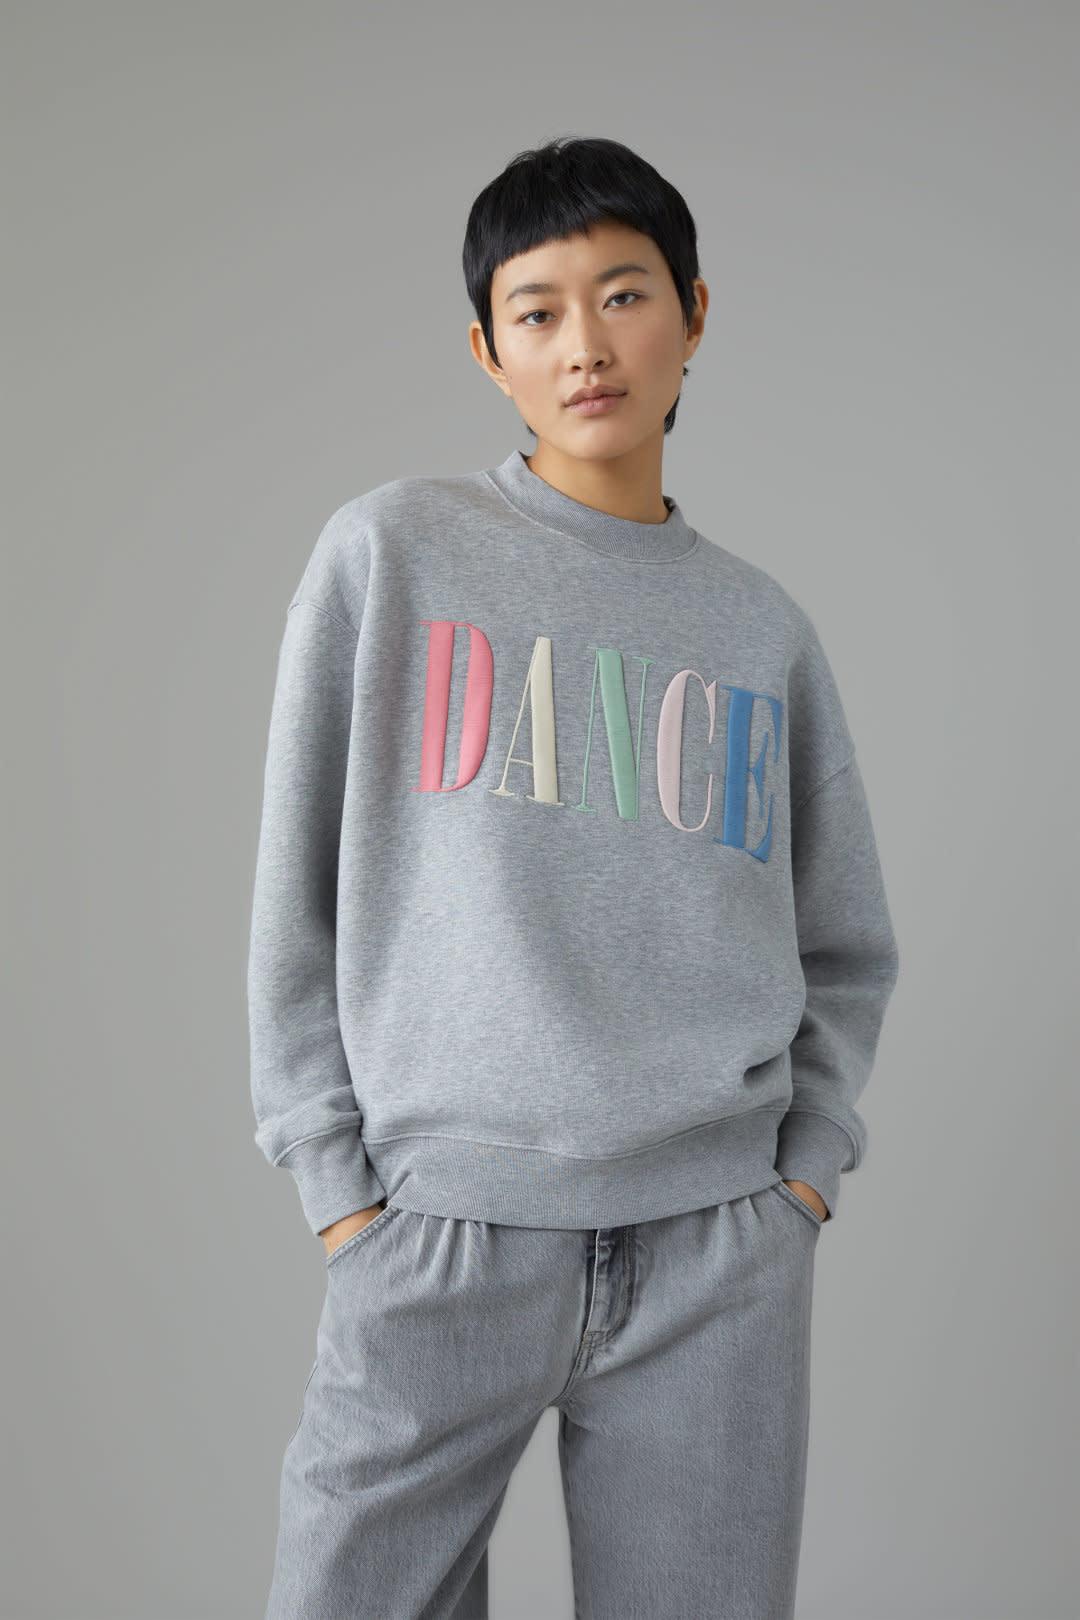 Dance Sweater - Grey-1